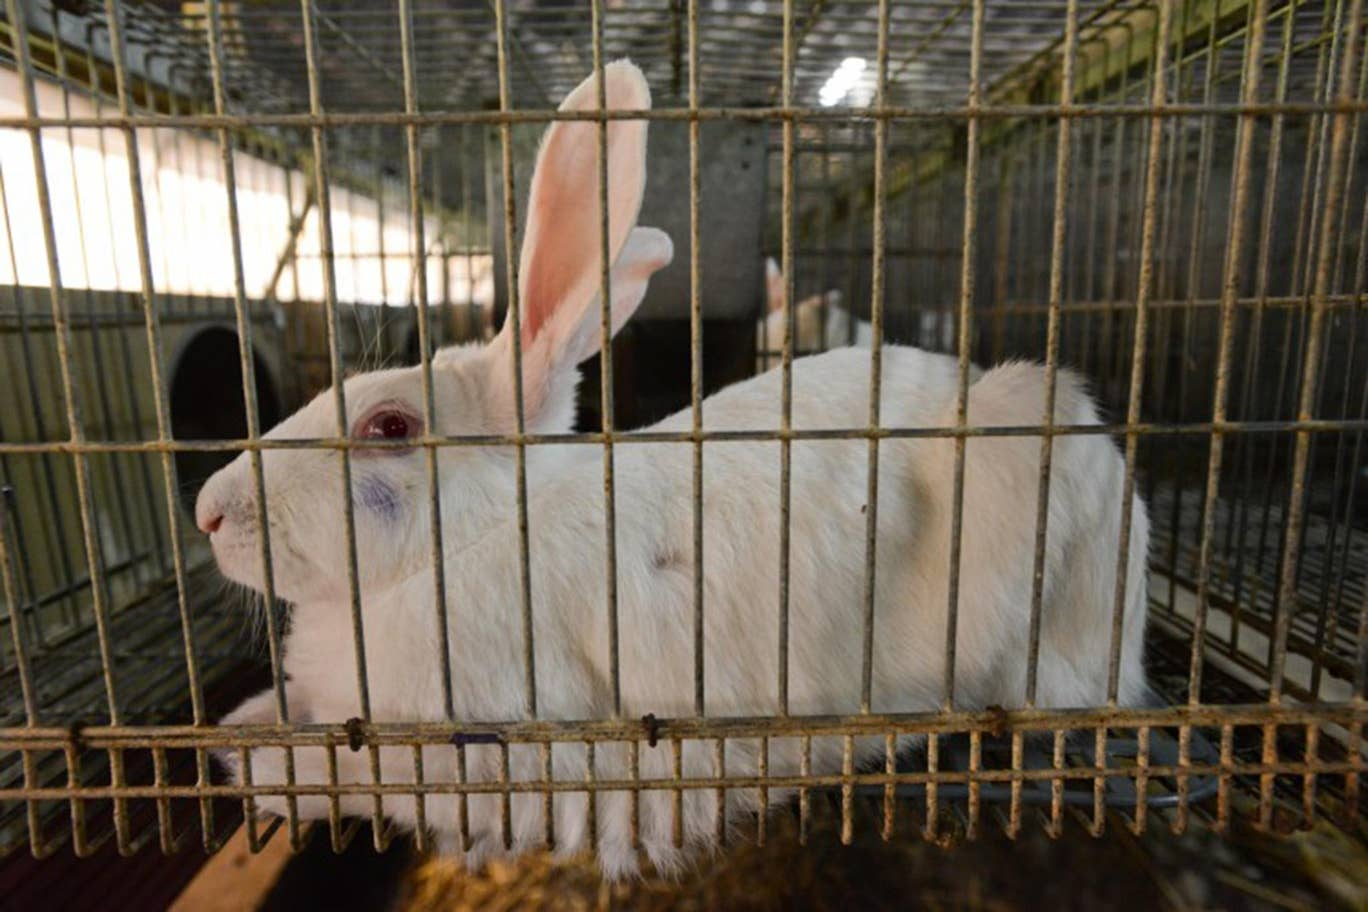 Rabbit in a breeding cage